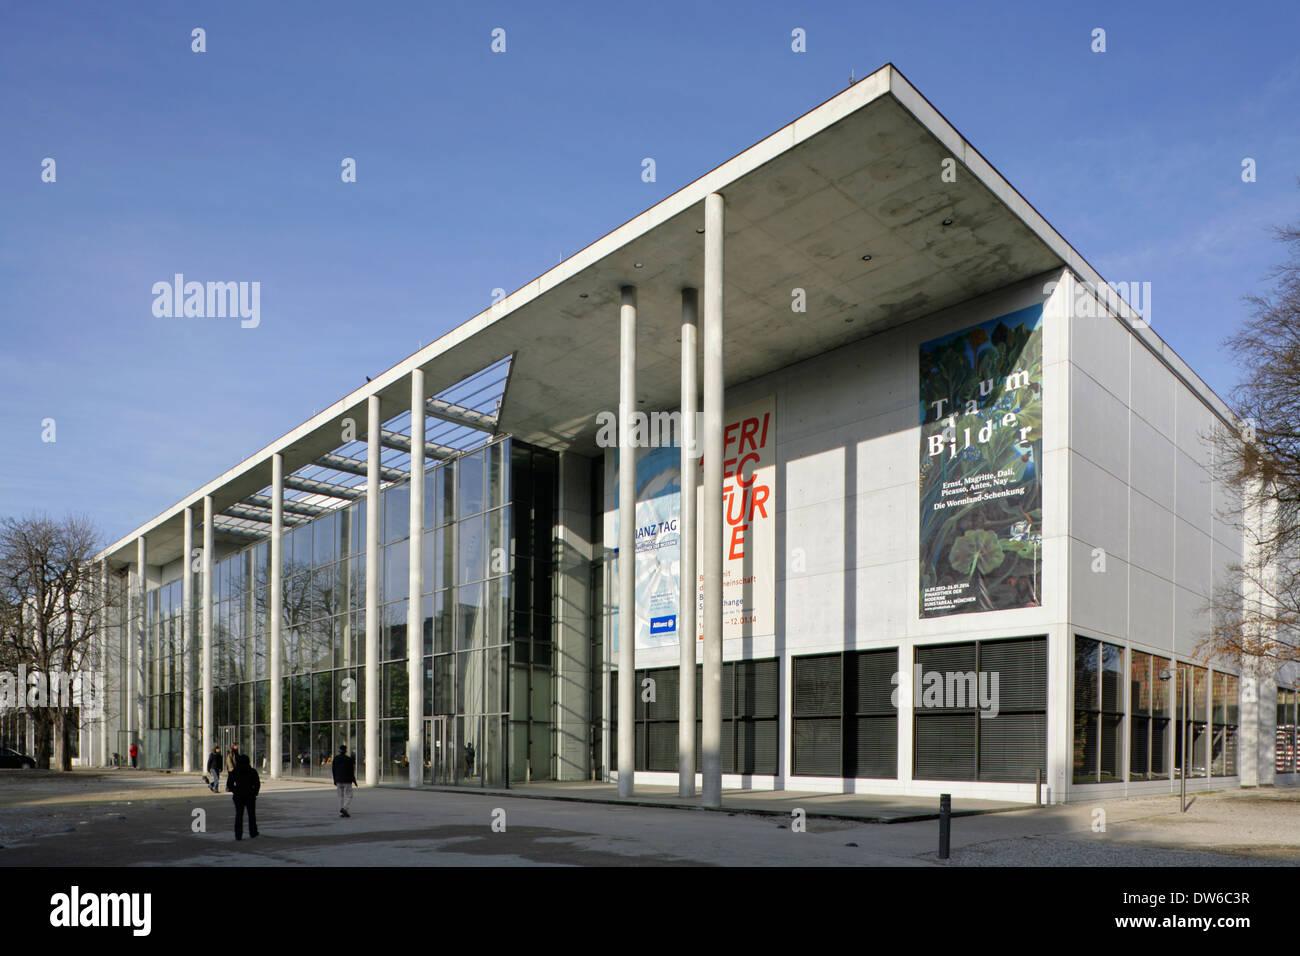 The Pinakothek der Moderne art museum, Munich, Germany. Stock Photo